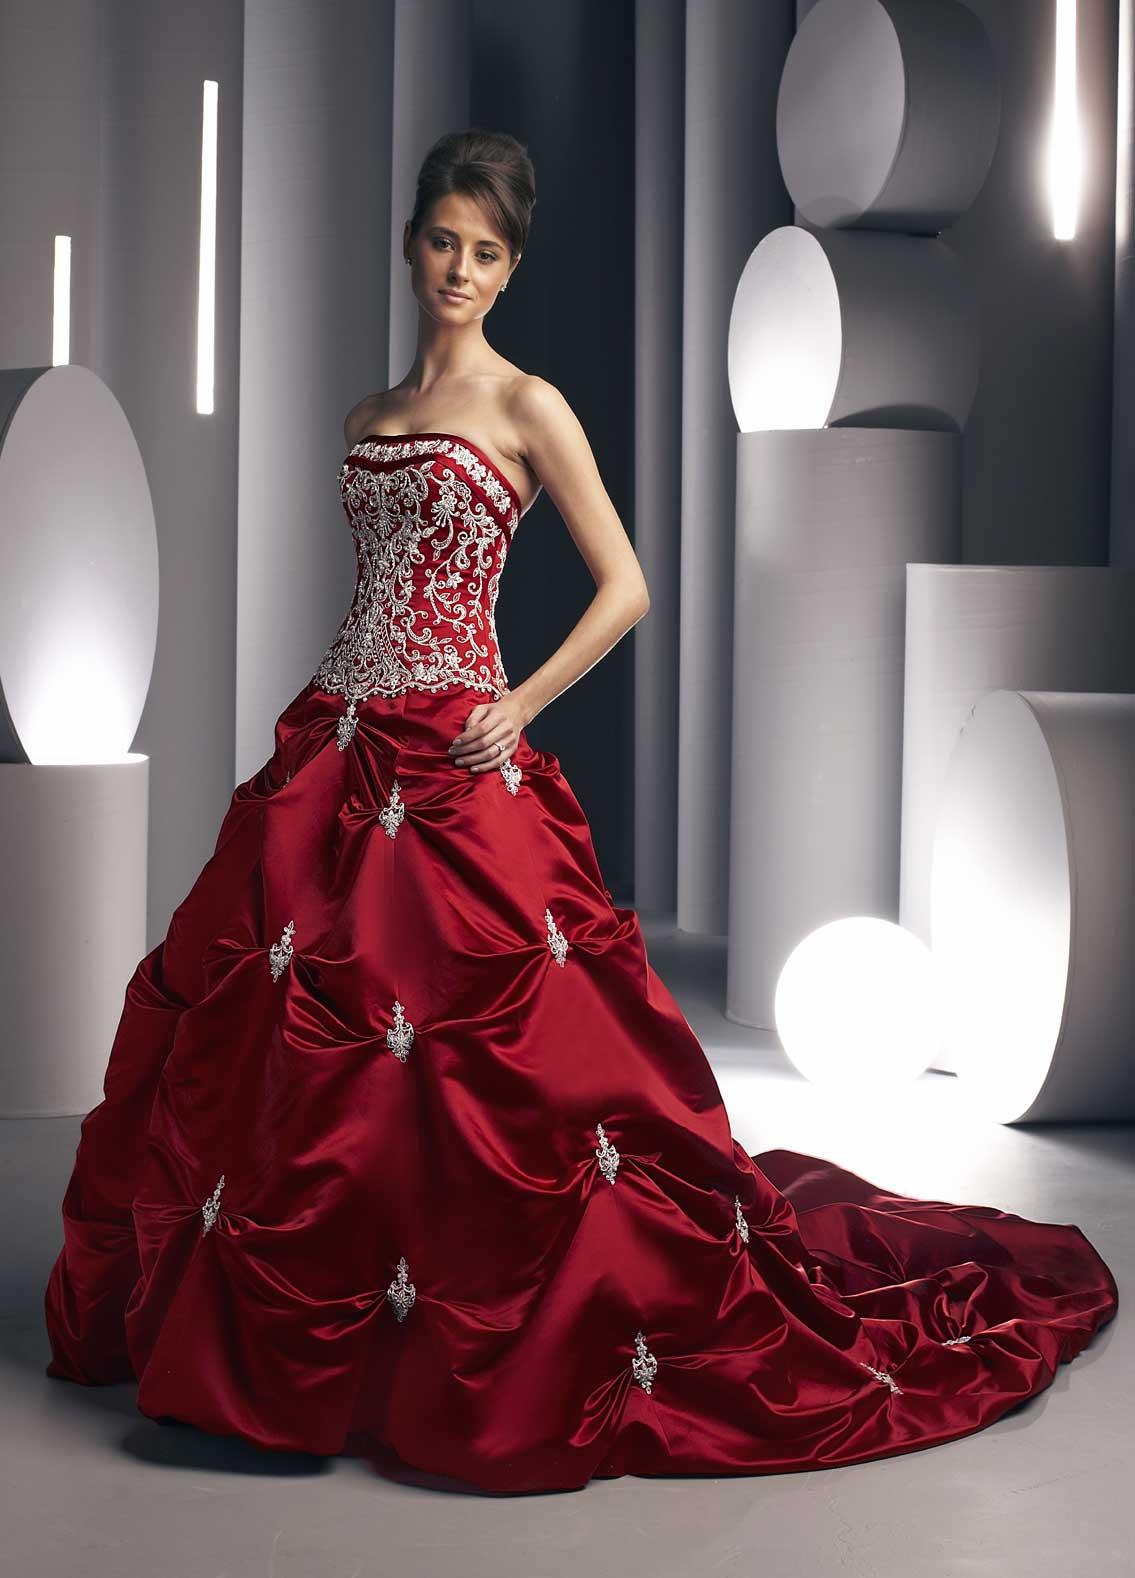 Most expensive wedding dresses designers